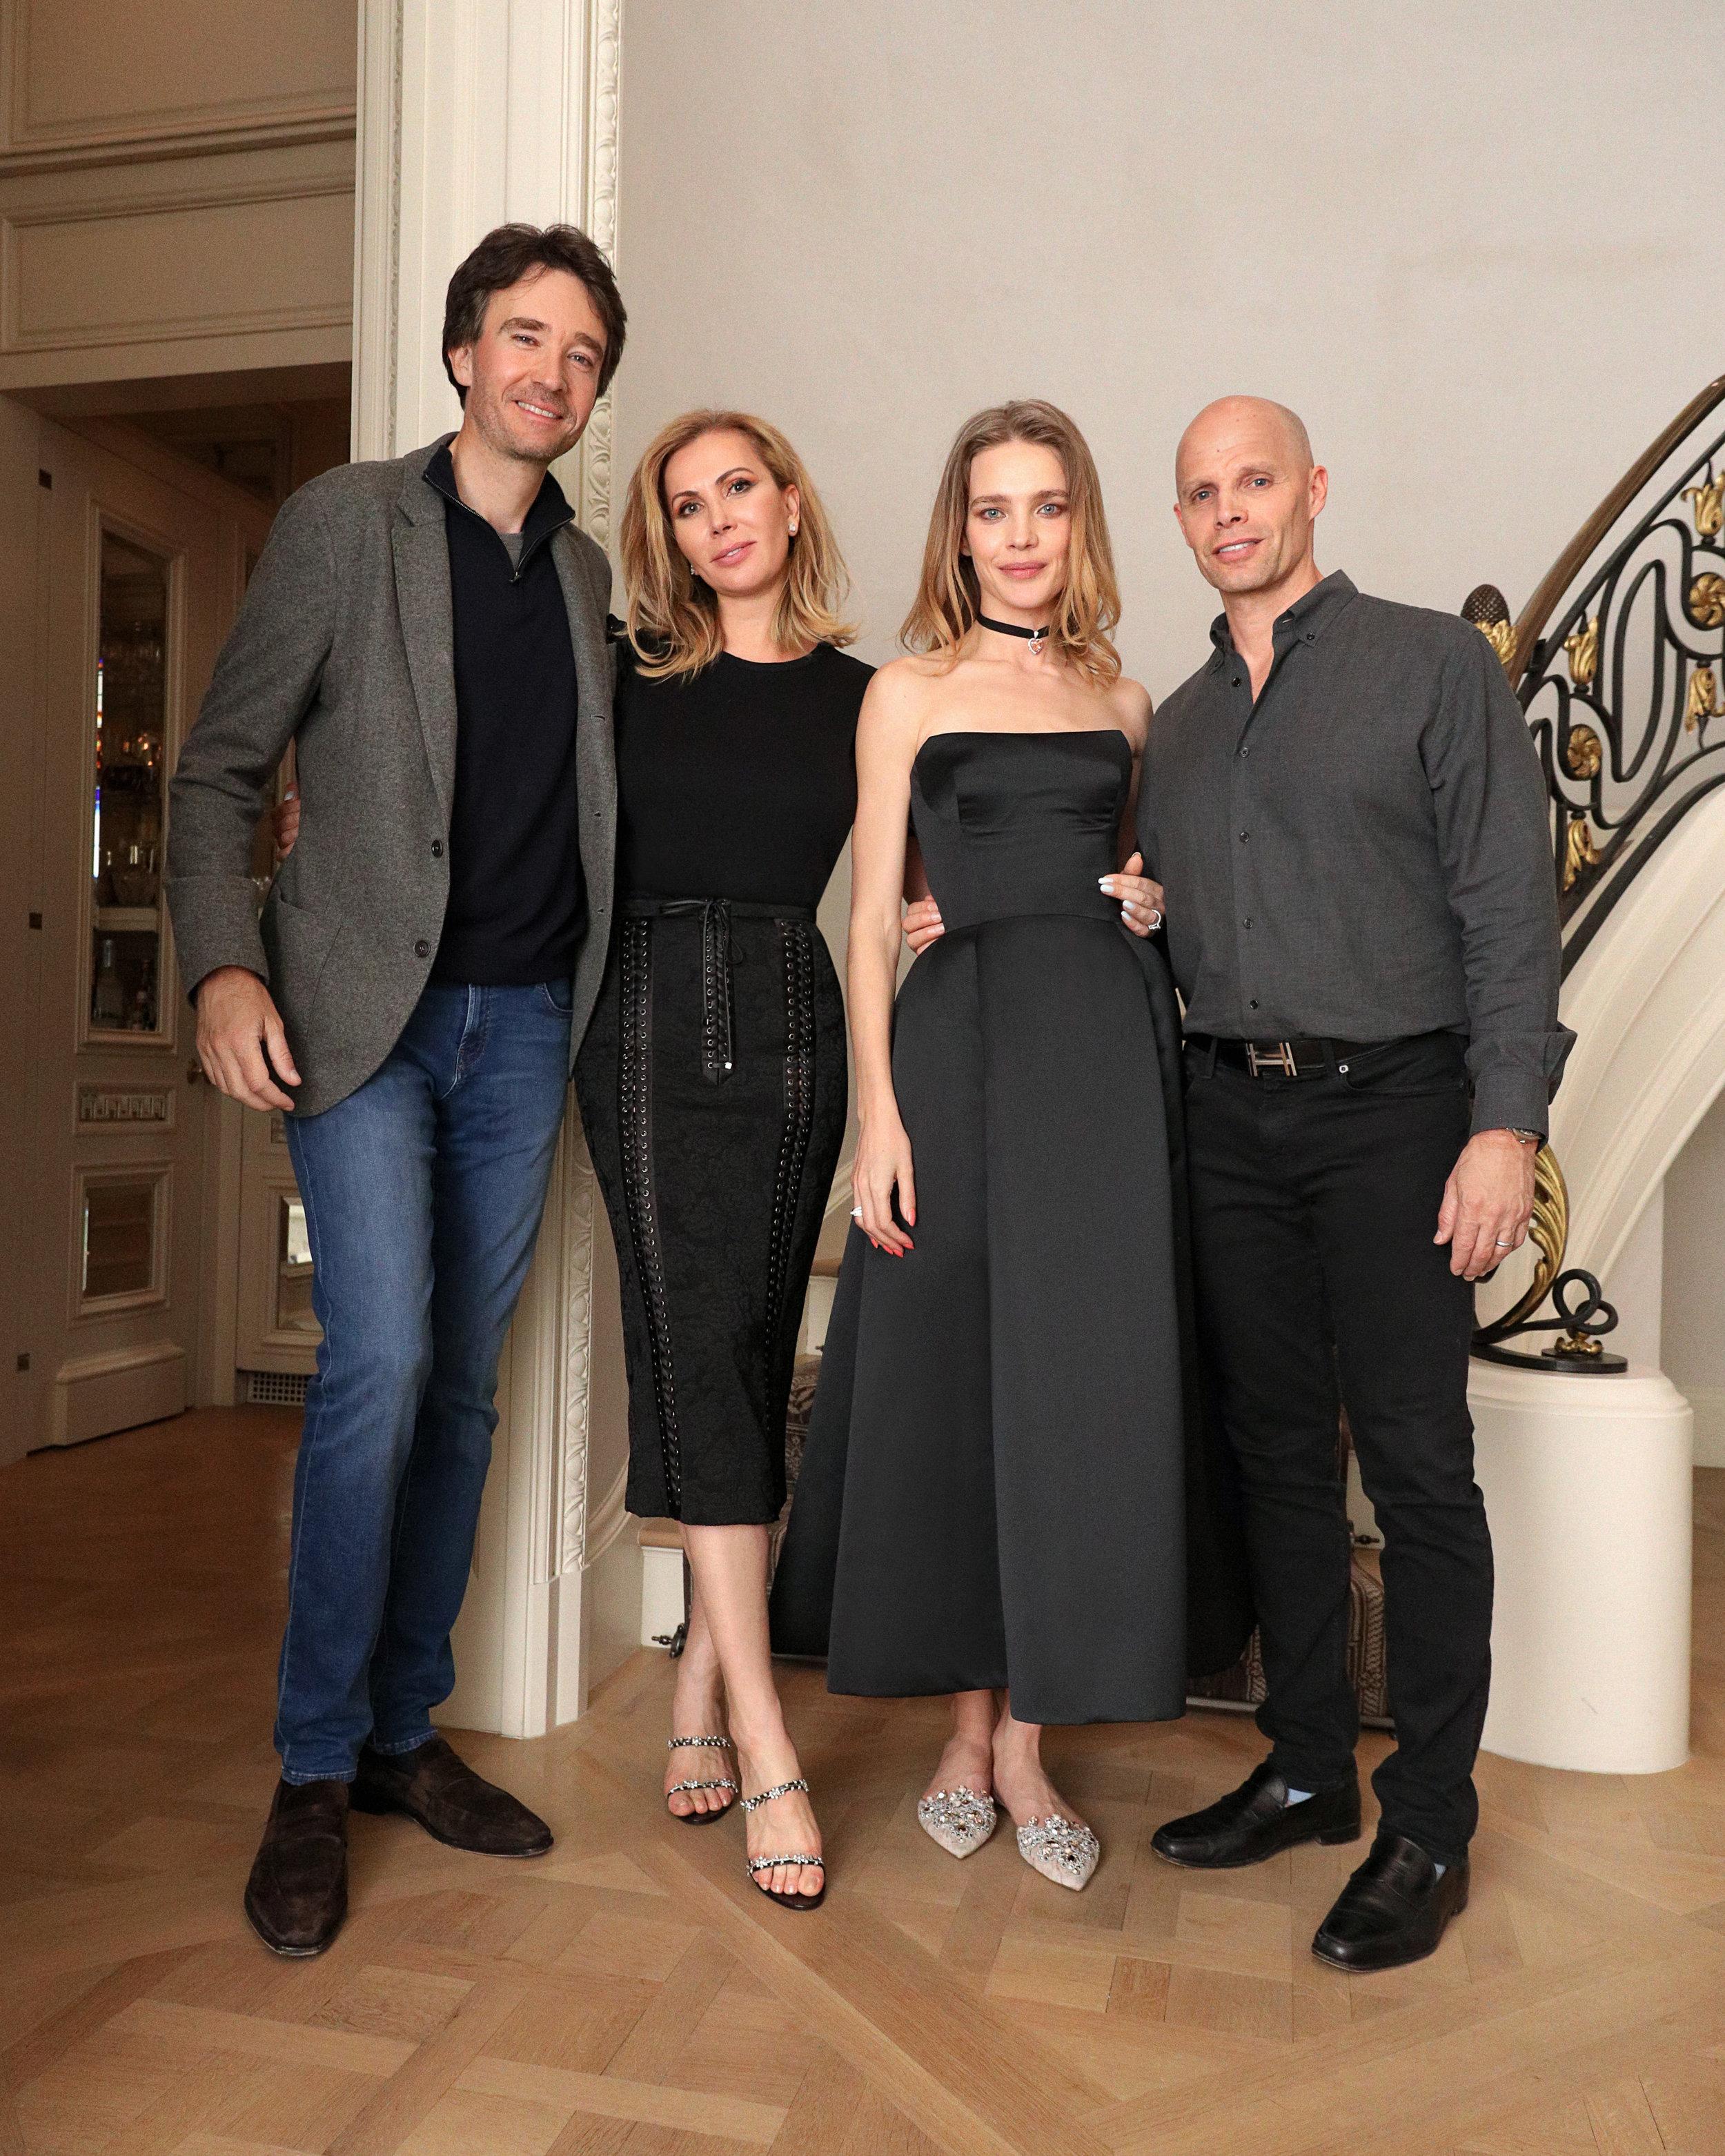 Antoine Arnault, Inga Rubenstein, Natalia Vodianova and Keith Rubenstein.